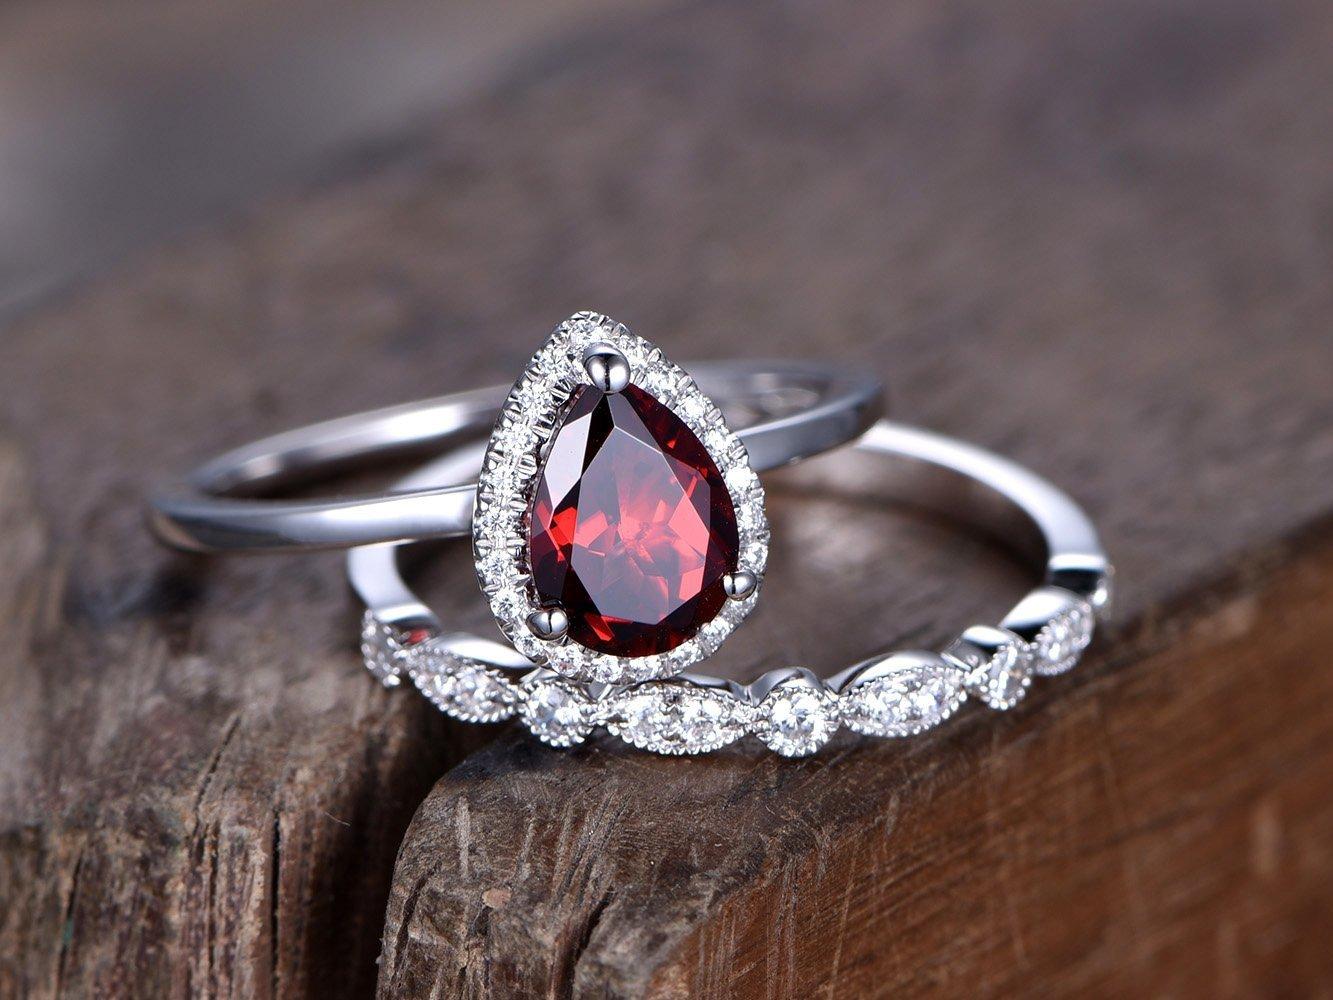 2pcs Wedding Ring Set,6x8mm Red Garnet Engagement Ring,Birthstone Ring,Plain Gold Band,White Gold Plated,Art Deco Wedding Band,Sterling Silver Bridal Set